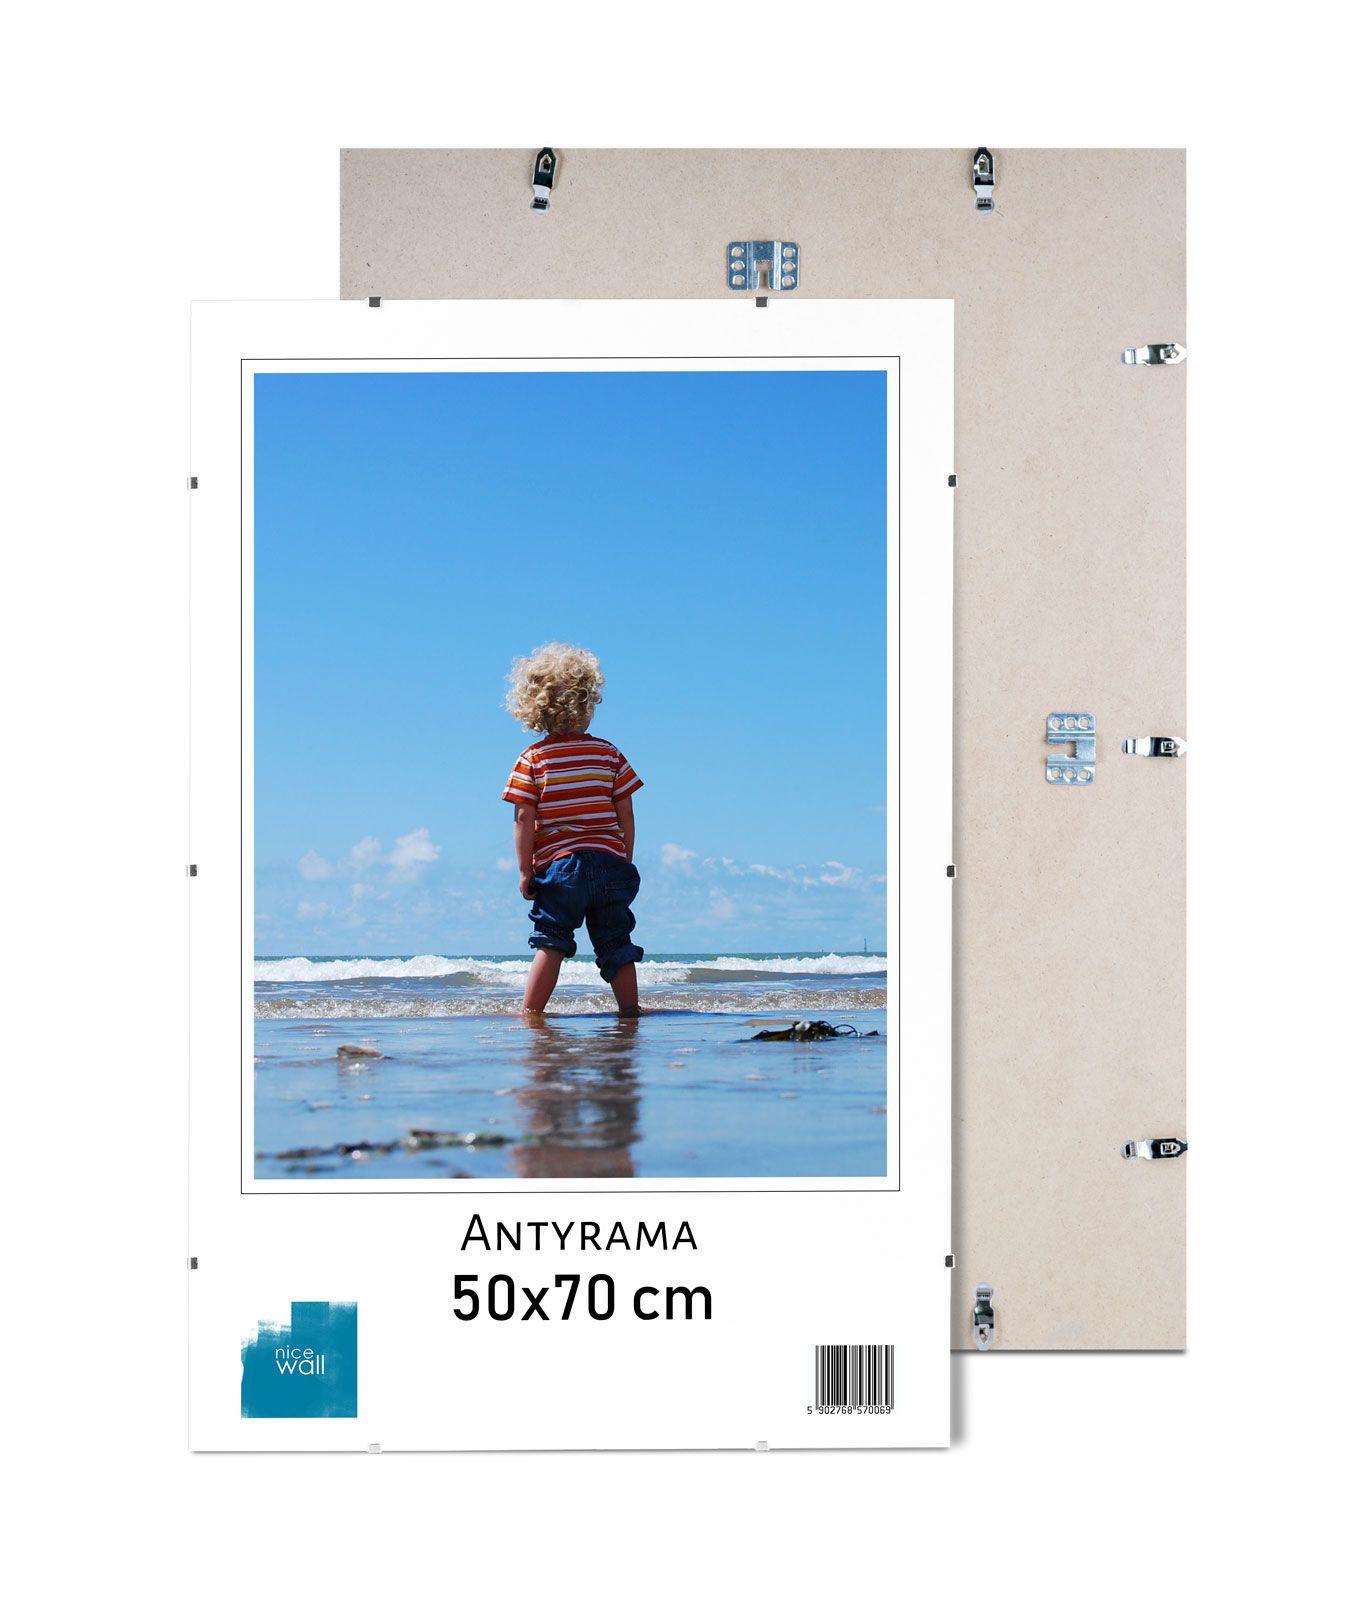 Antirama 50x70 cm Antirami 70x50 cm Formát B2